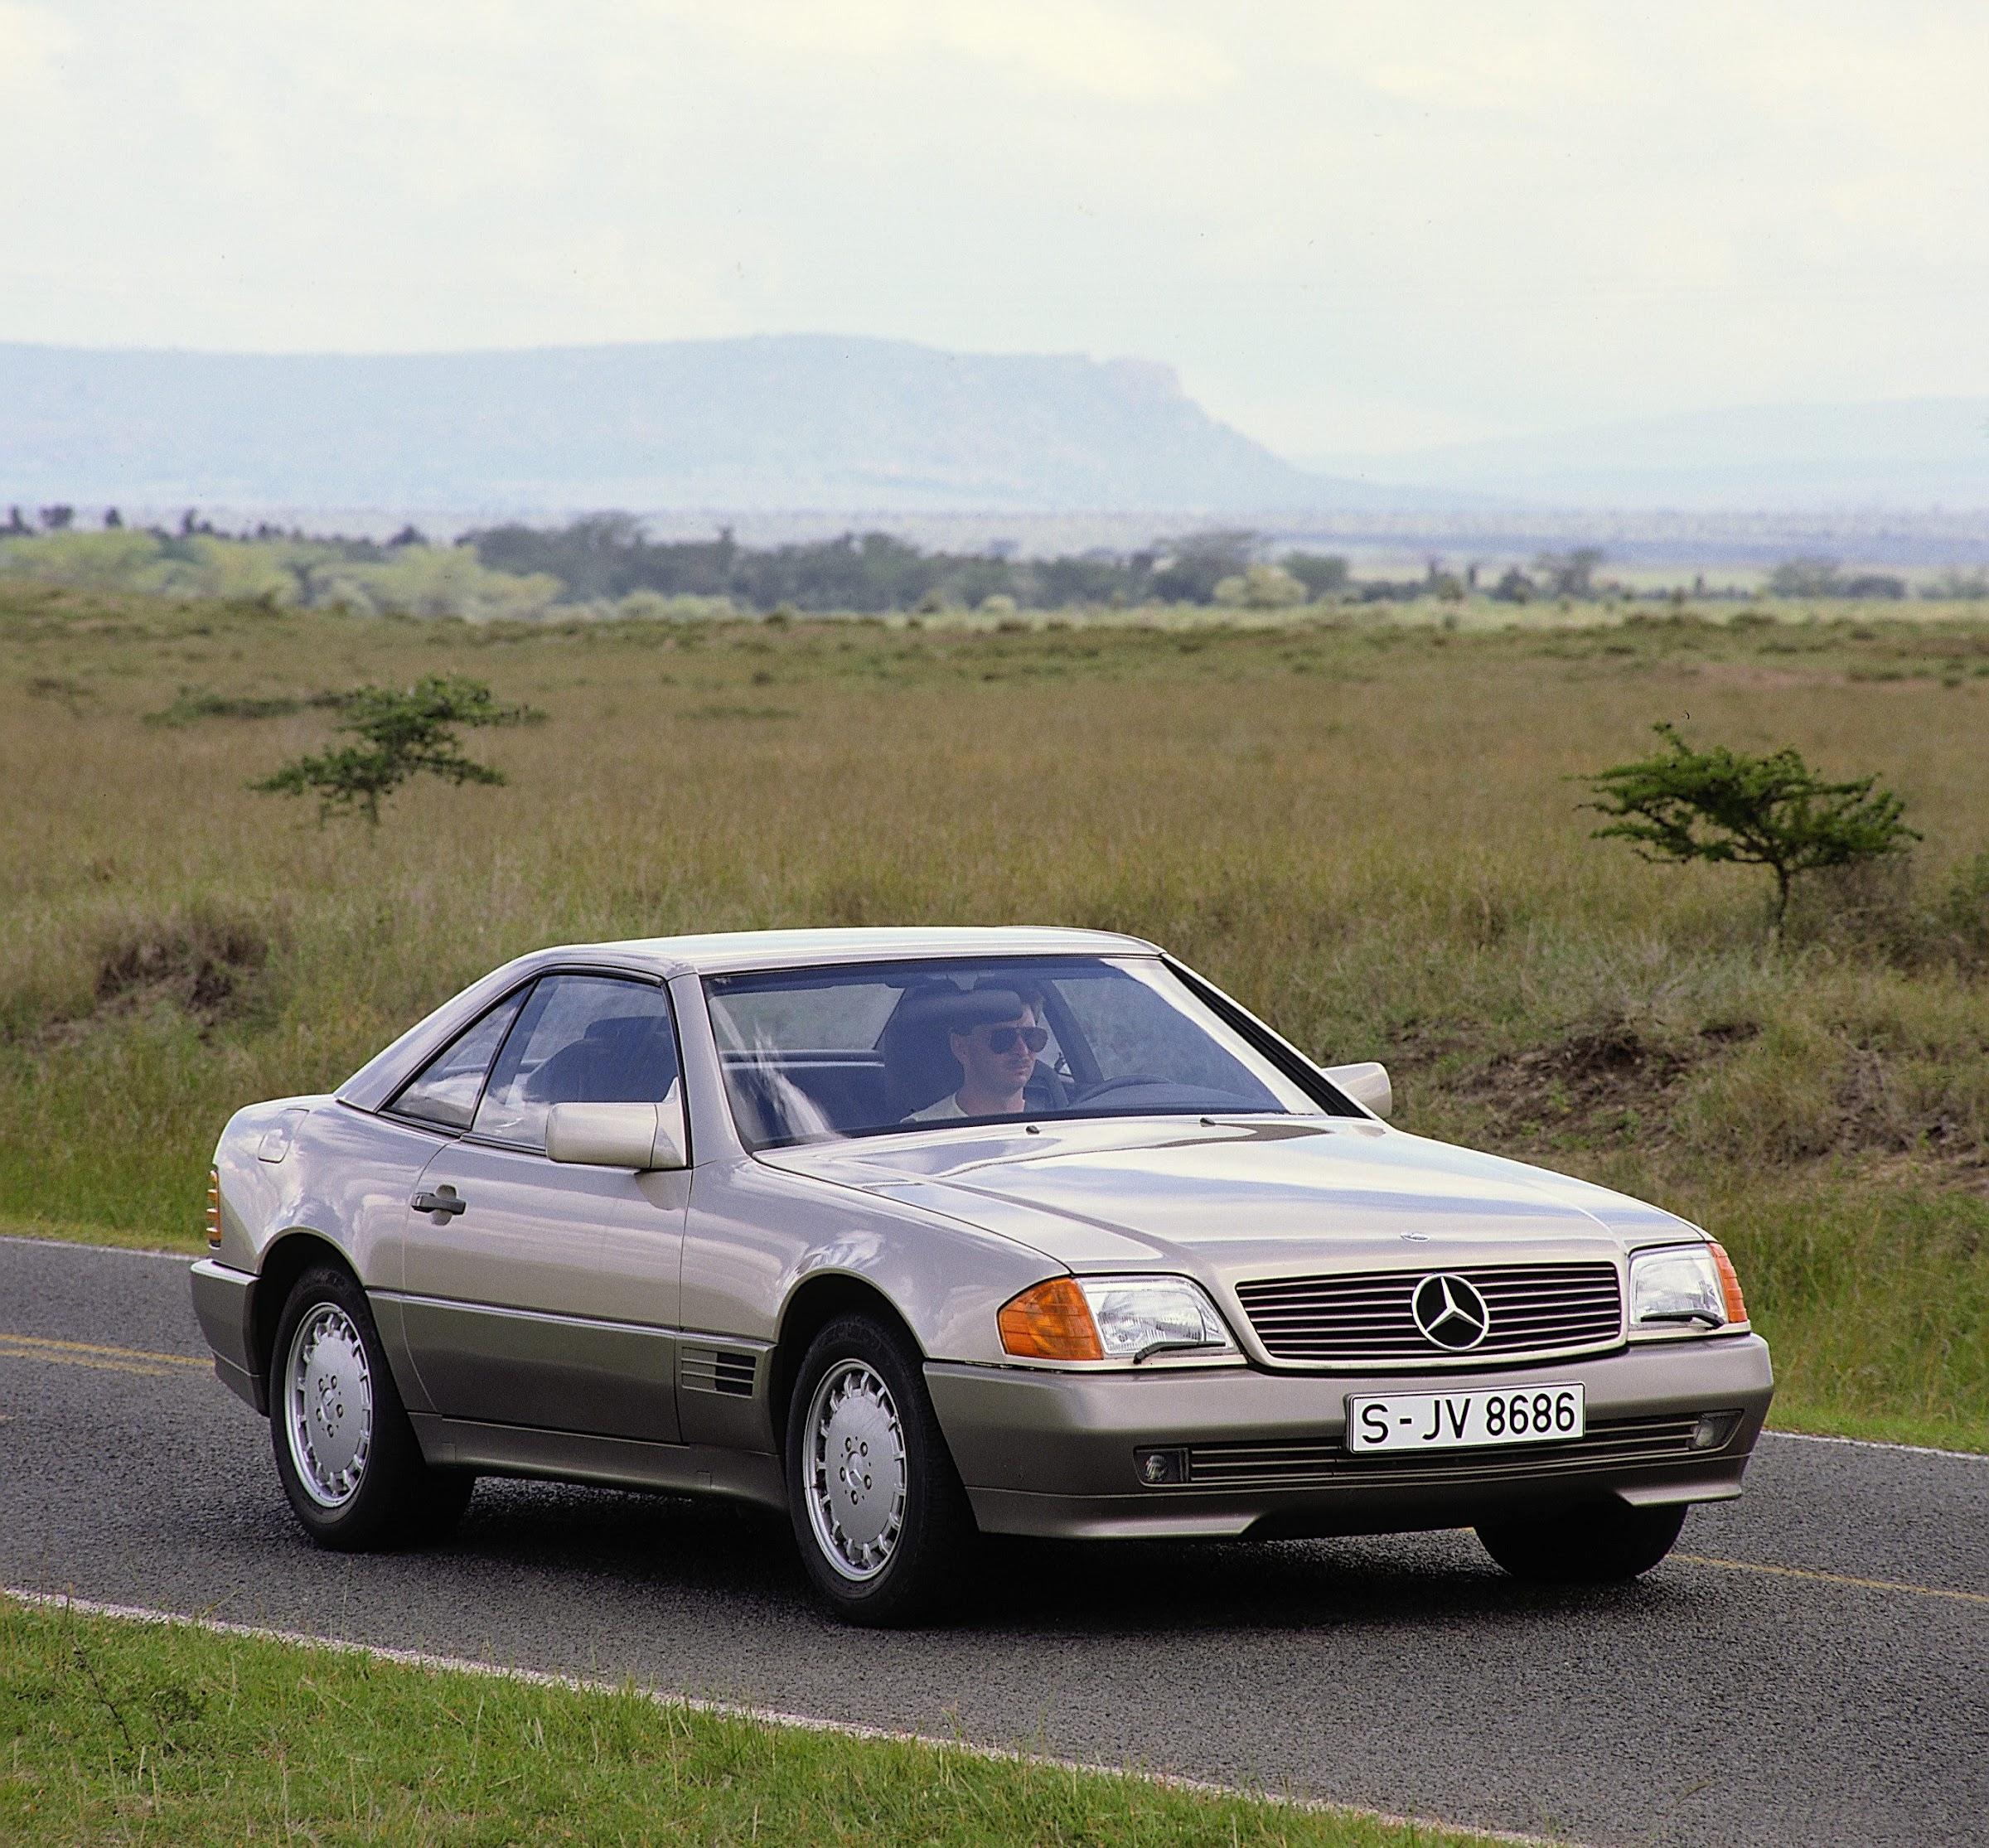 UI9fcs1Ixh fUvAquQwDS9QdClSd8U5ROW0A T6wBsc3Aiy8Z1kaTABBKCLlqRn3H31Sfd S K0LX1mTDSWMxtcDfzUVFcu1onPXDzqsldldTZ nCgAGGOLtR4XxTCyiJSV55asLyA=w2400 - Mercedes-Benz SL R 129: vuelta a 1989